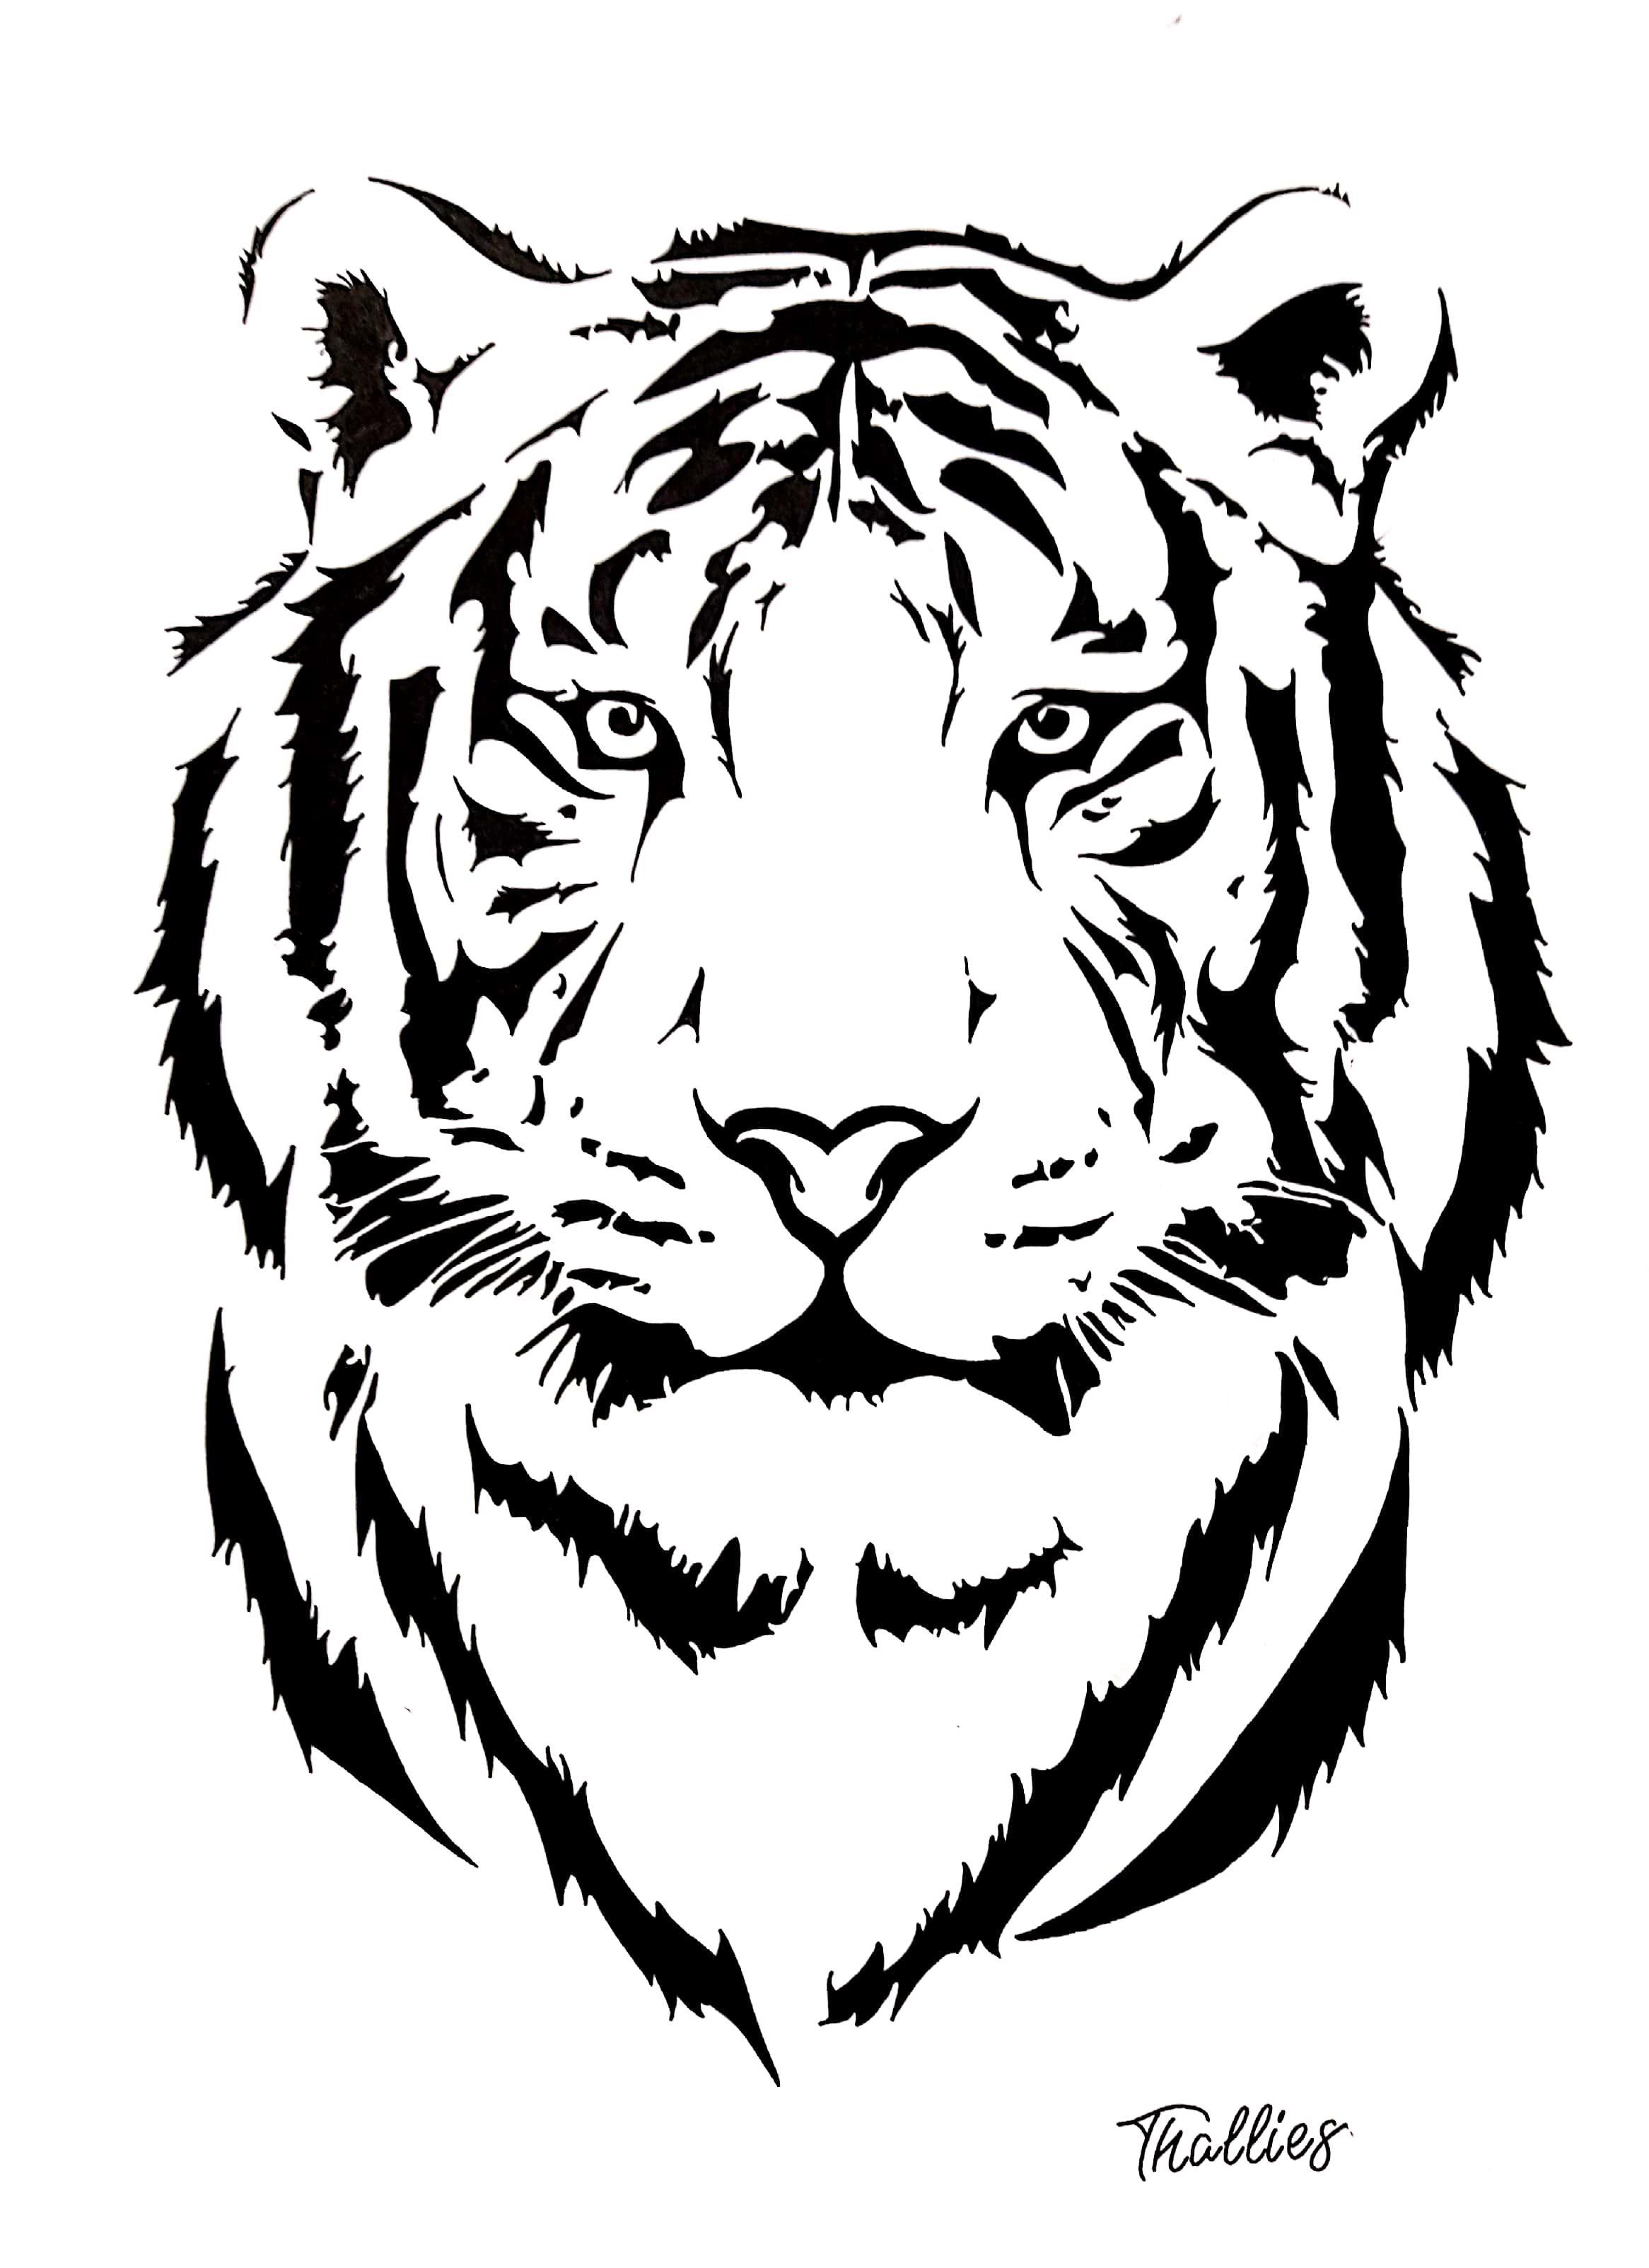 Tigre Stencil Art Cara De Tigre Dibujo Ilustracion De Tigre Tigre Para Dibujar